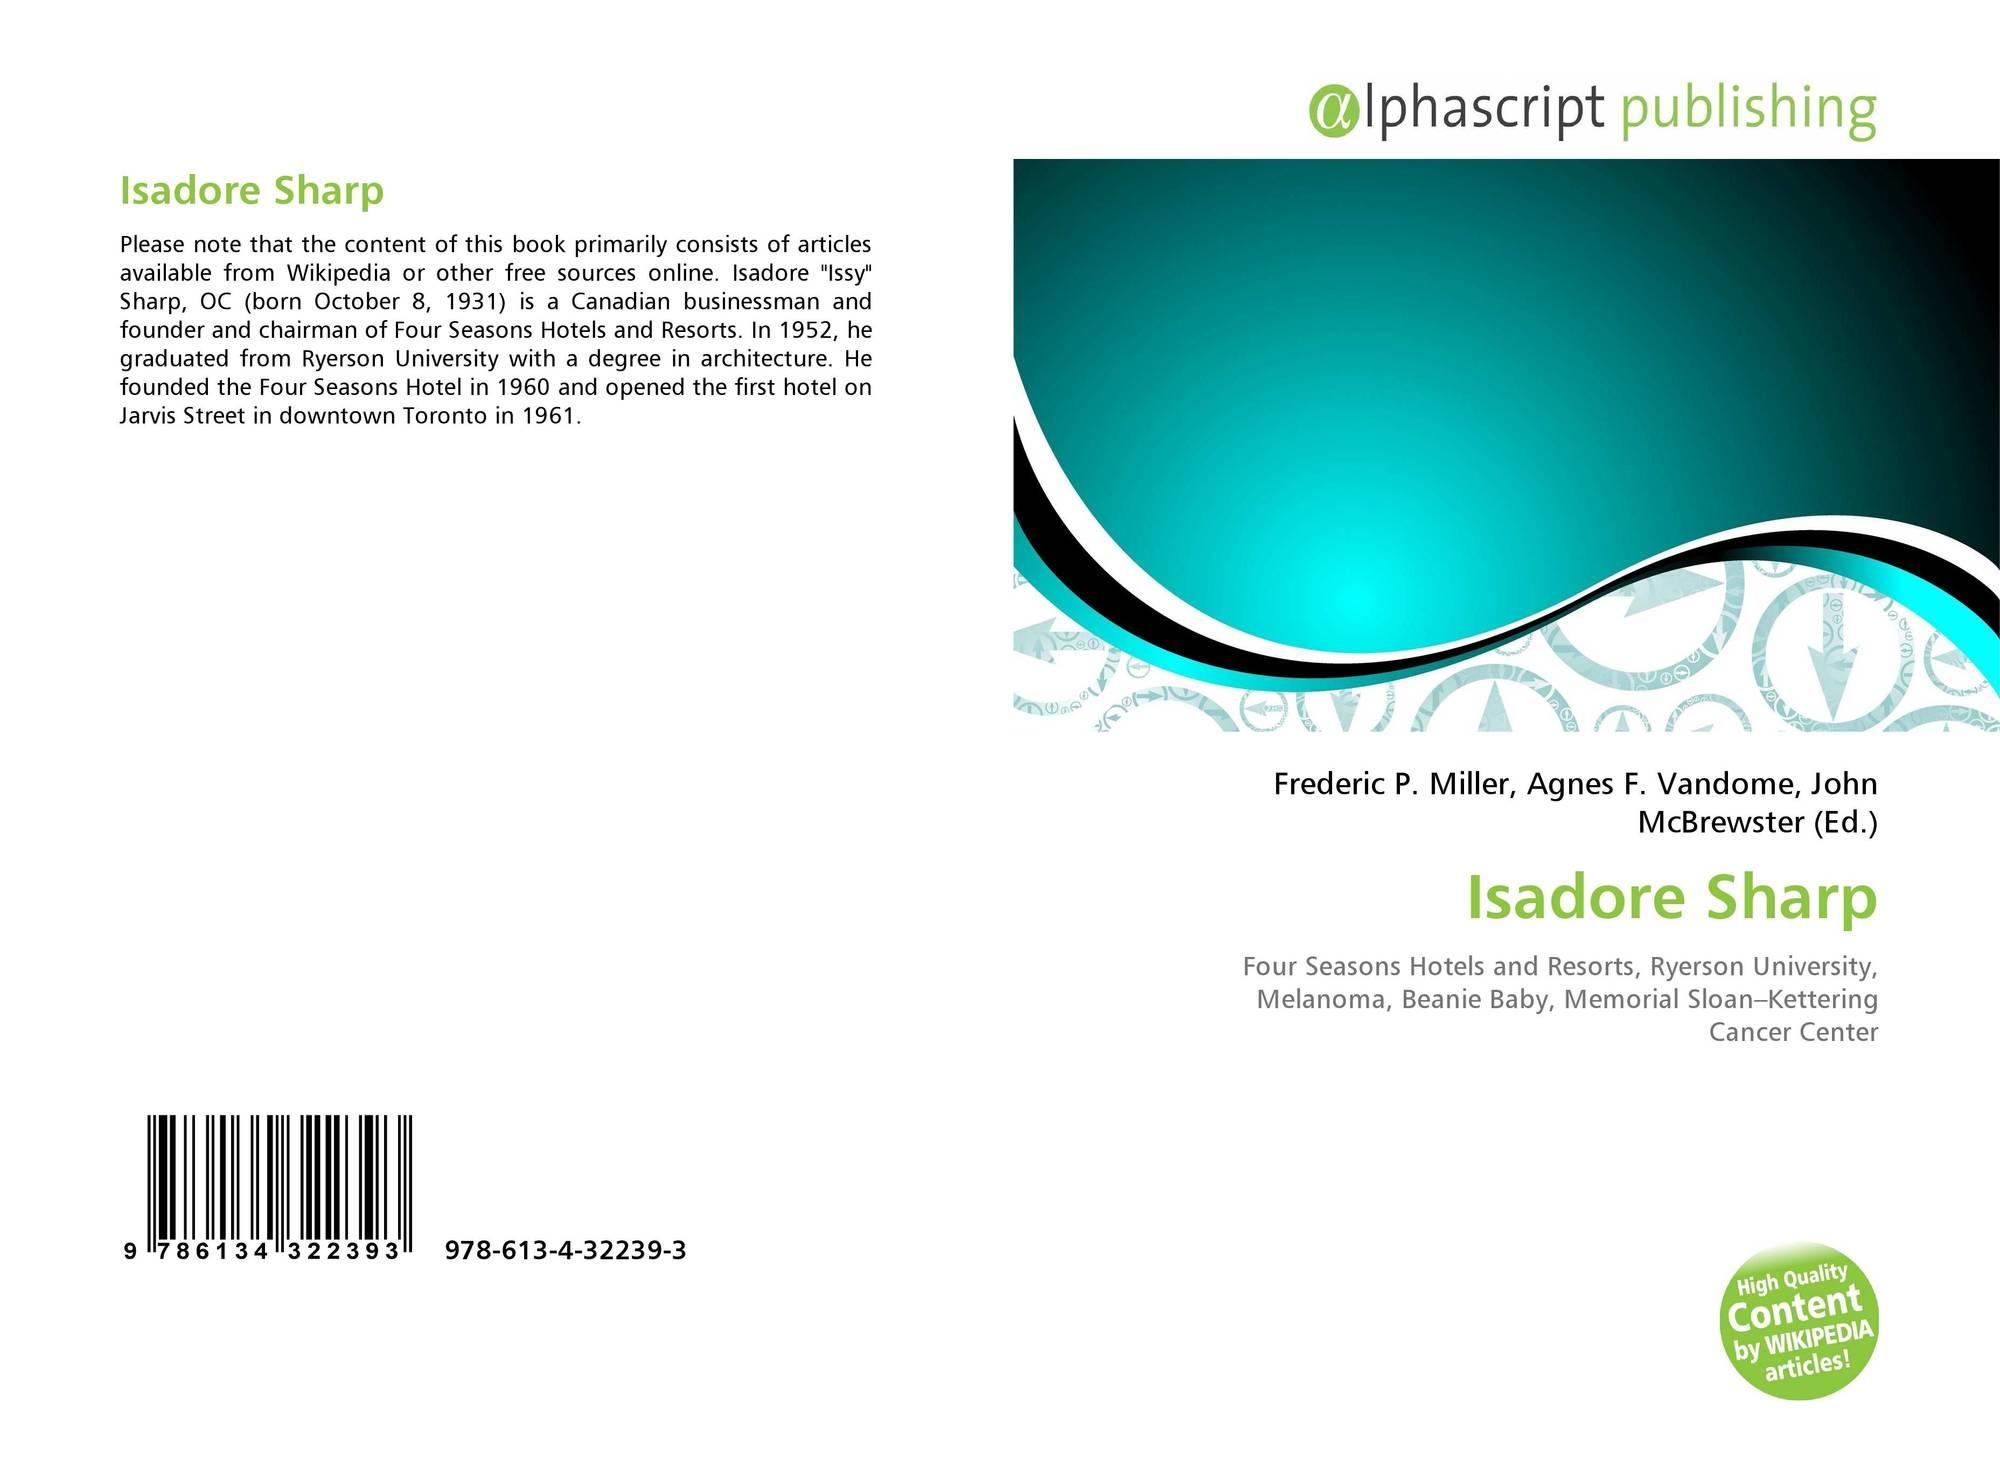 Isadore Sharp, 978-613-4-32239-3, 6134322393 ,9786134322393